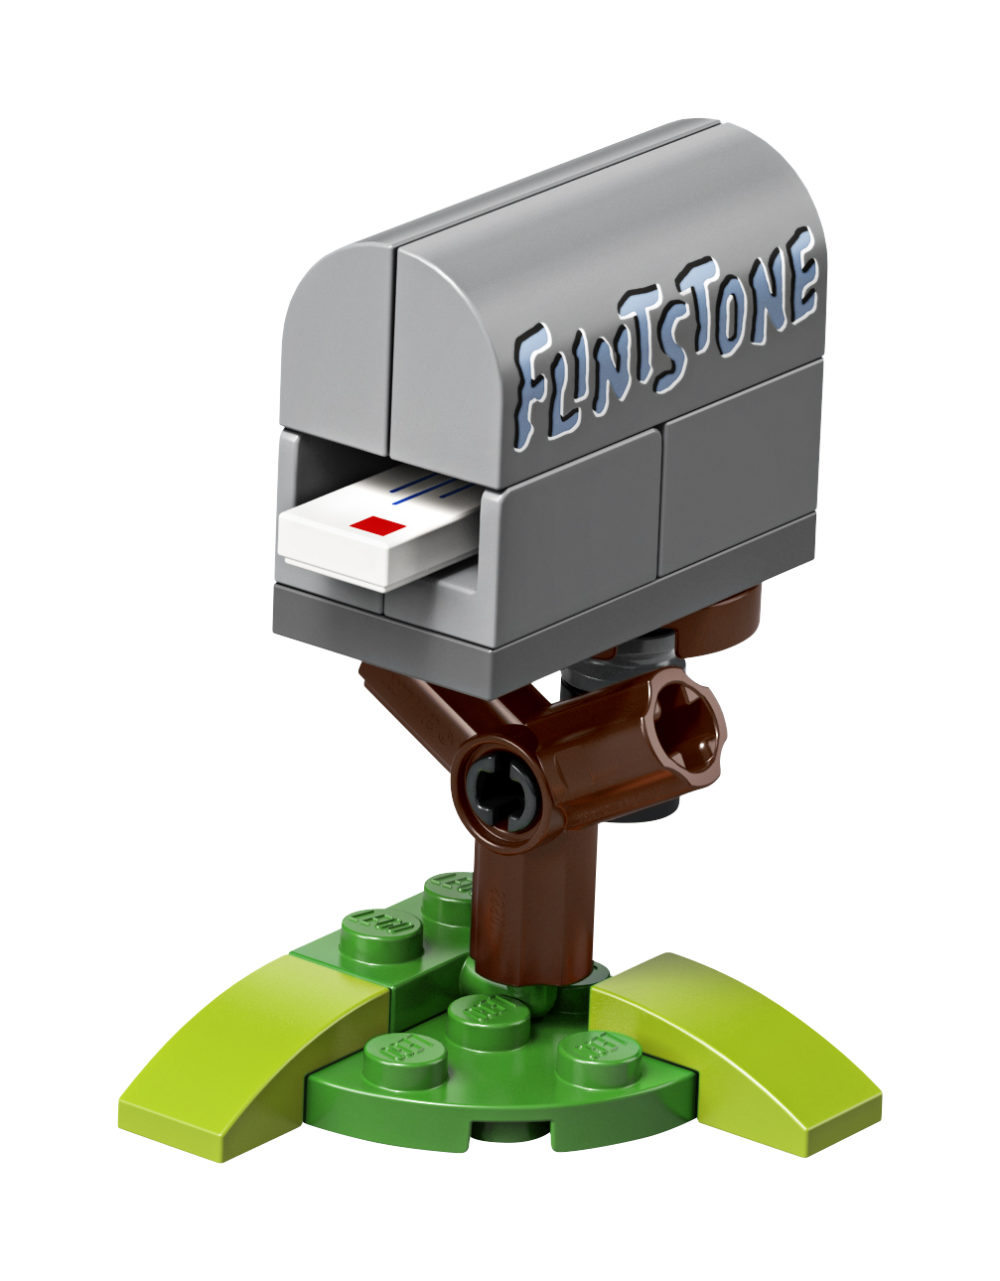 LEGO Ideas The Flintstones - Mailbox